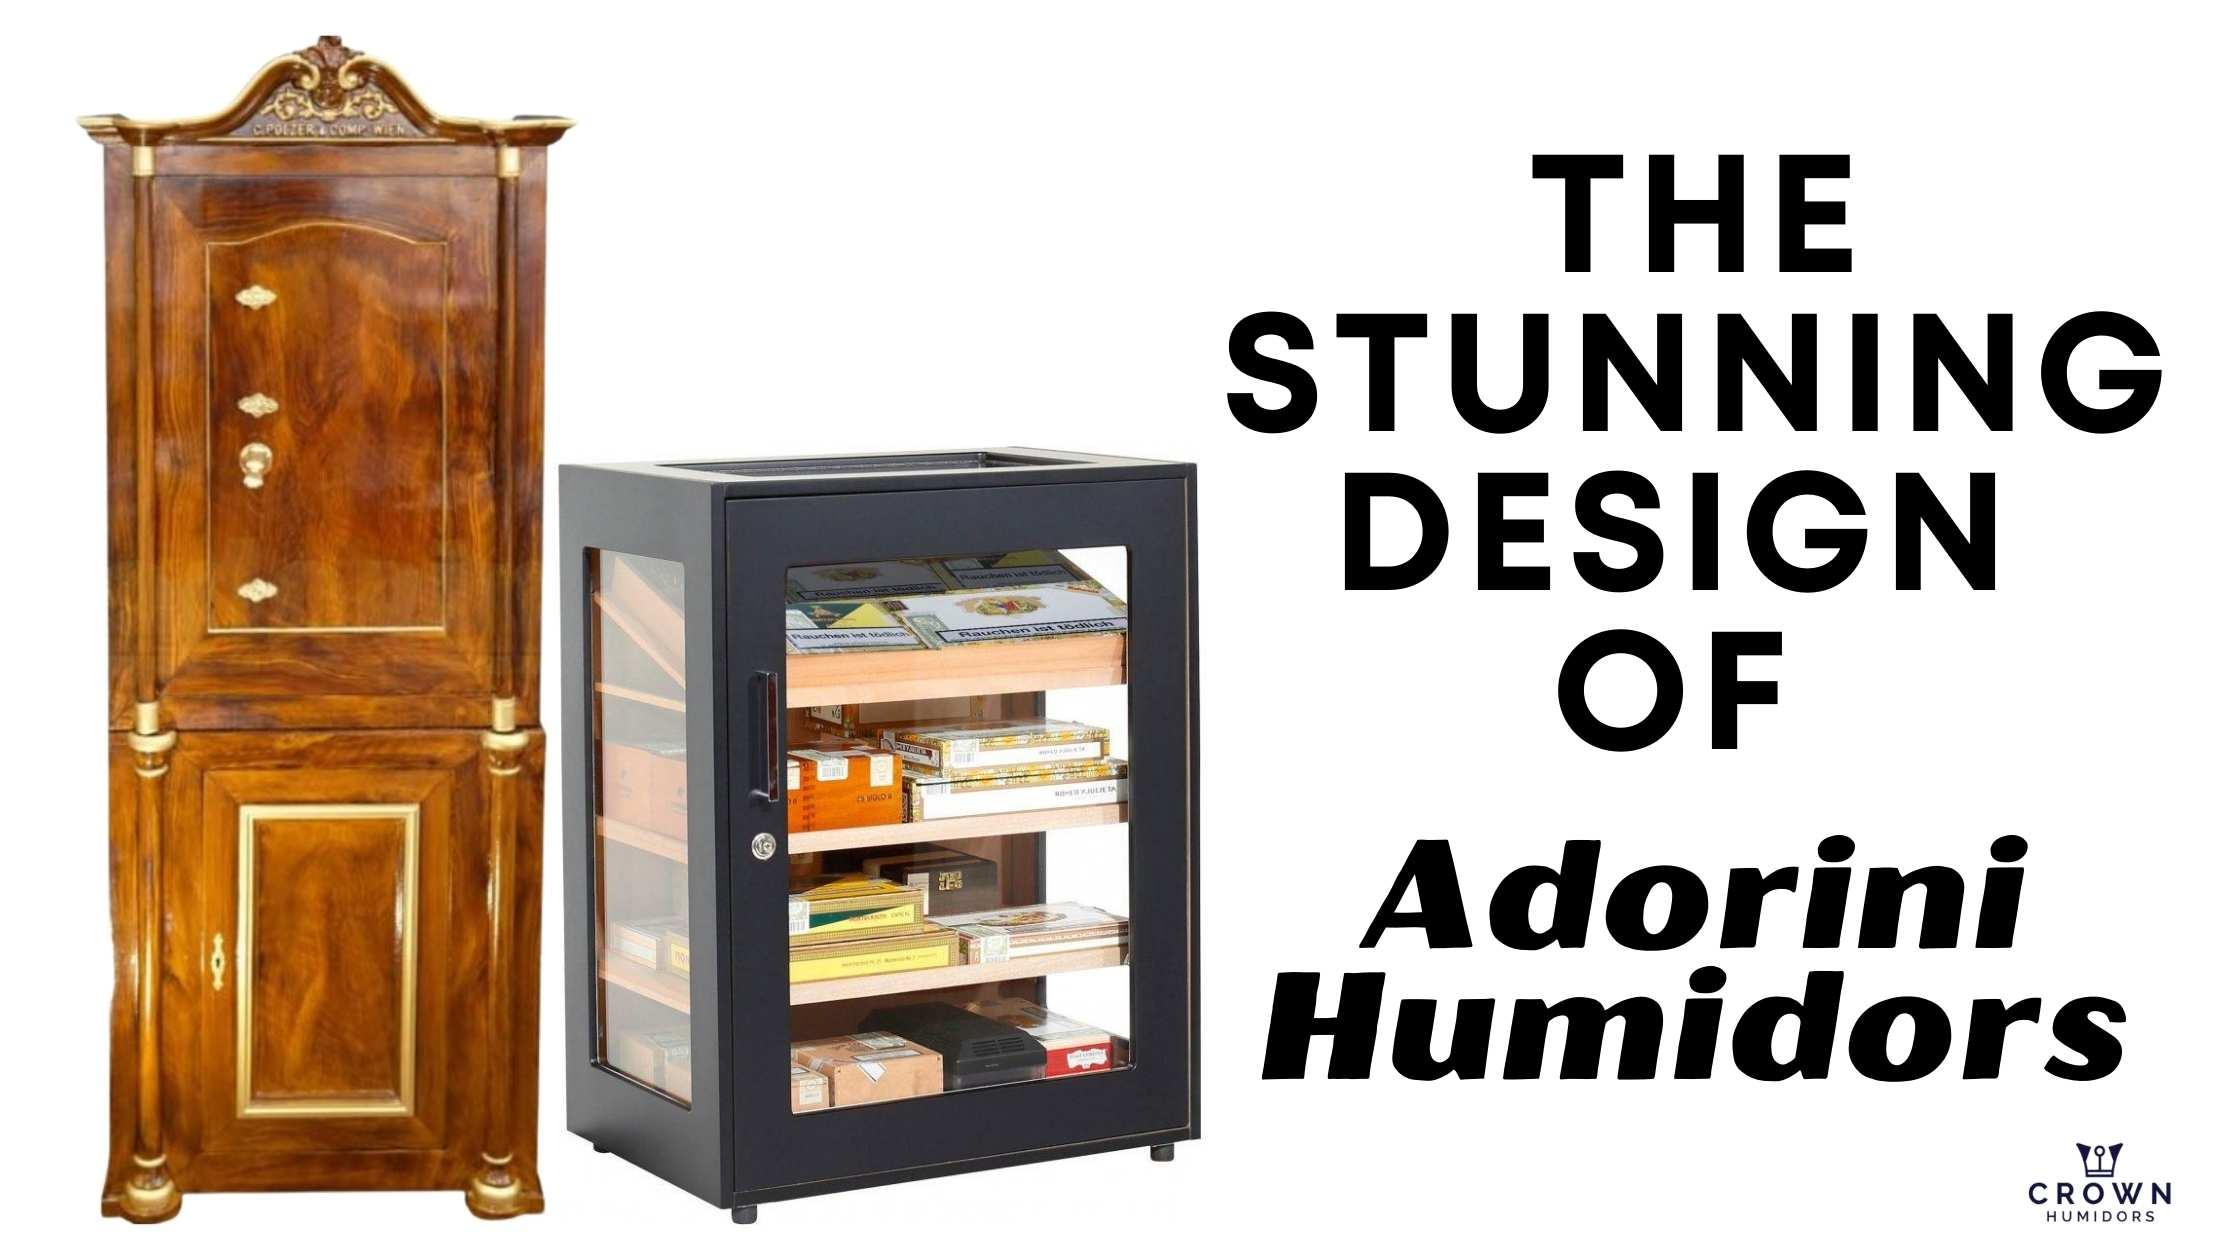 The stunning design of adorini humidors